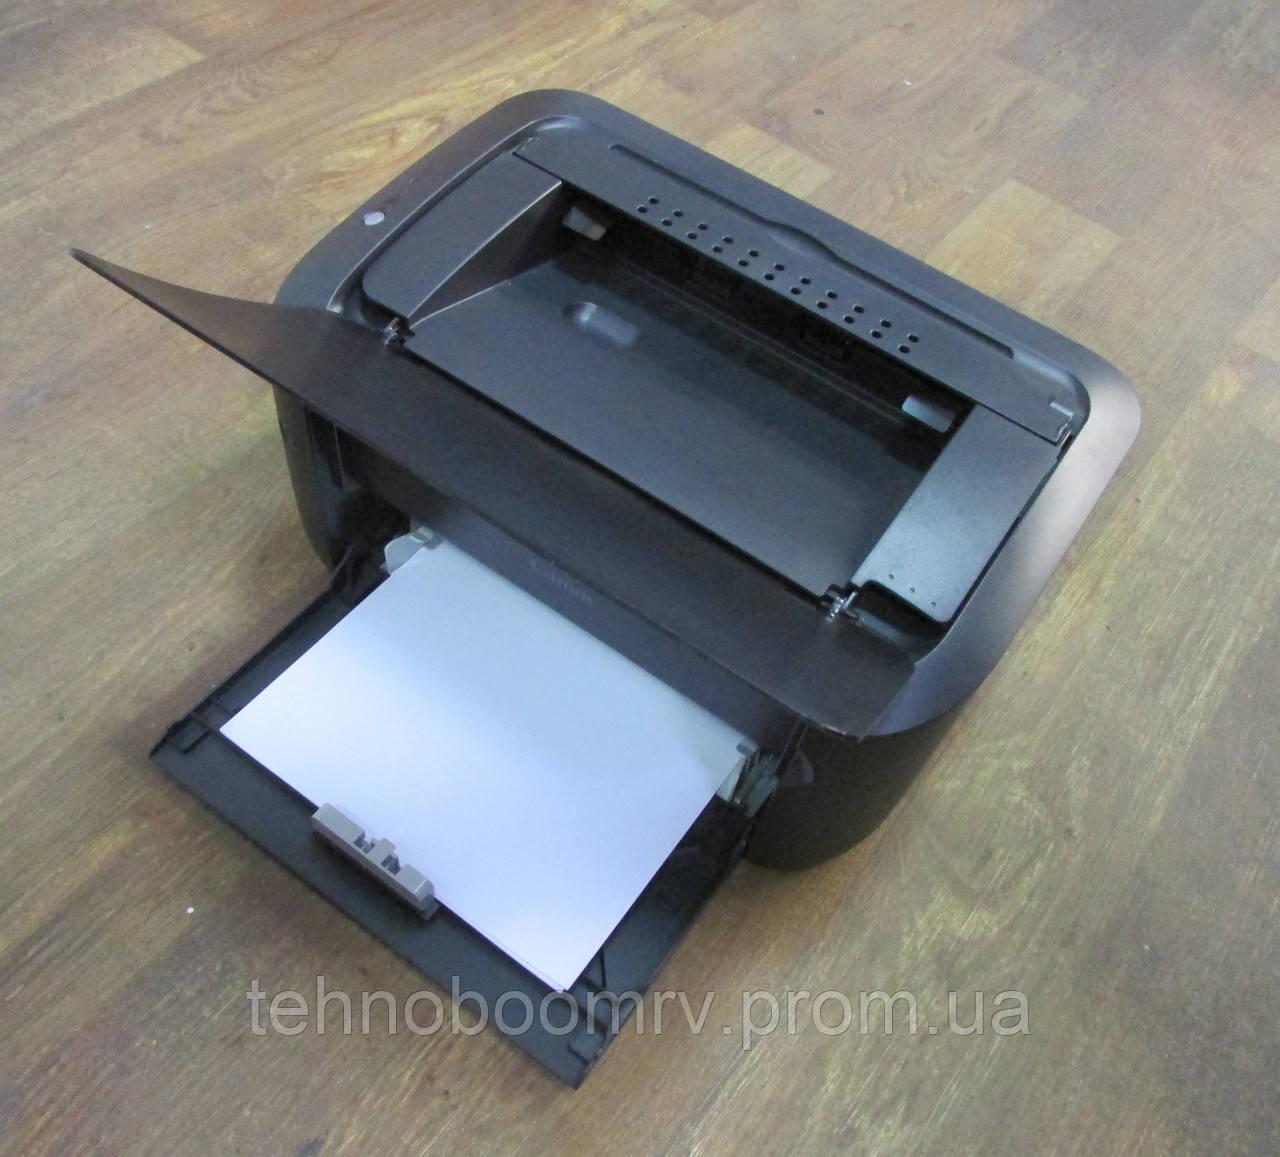 CANON I SENSYS LBP3010B PRINTER DRIVER PC